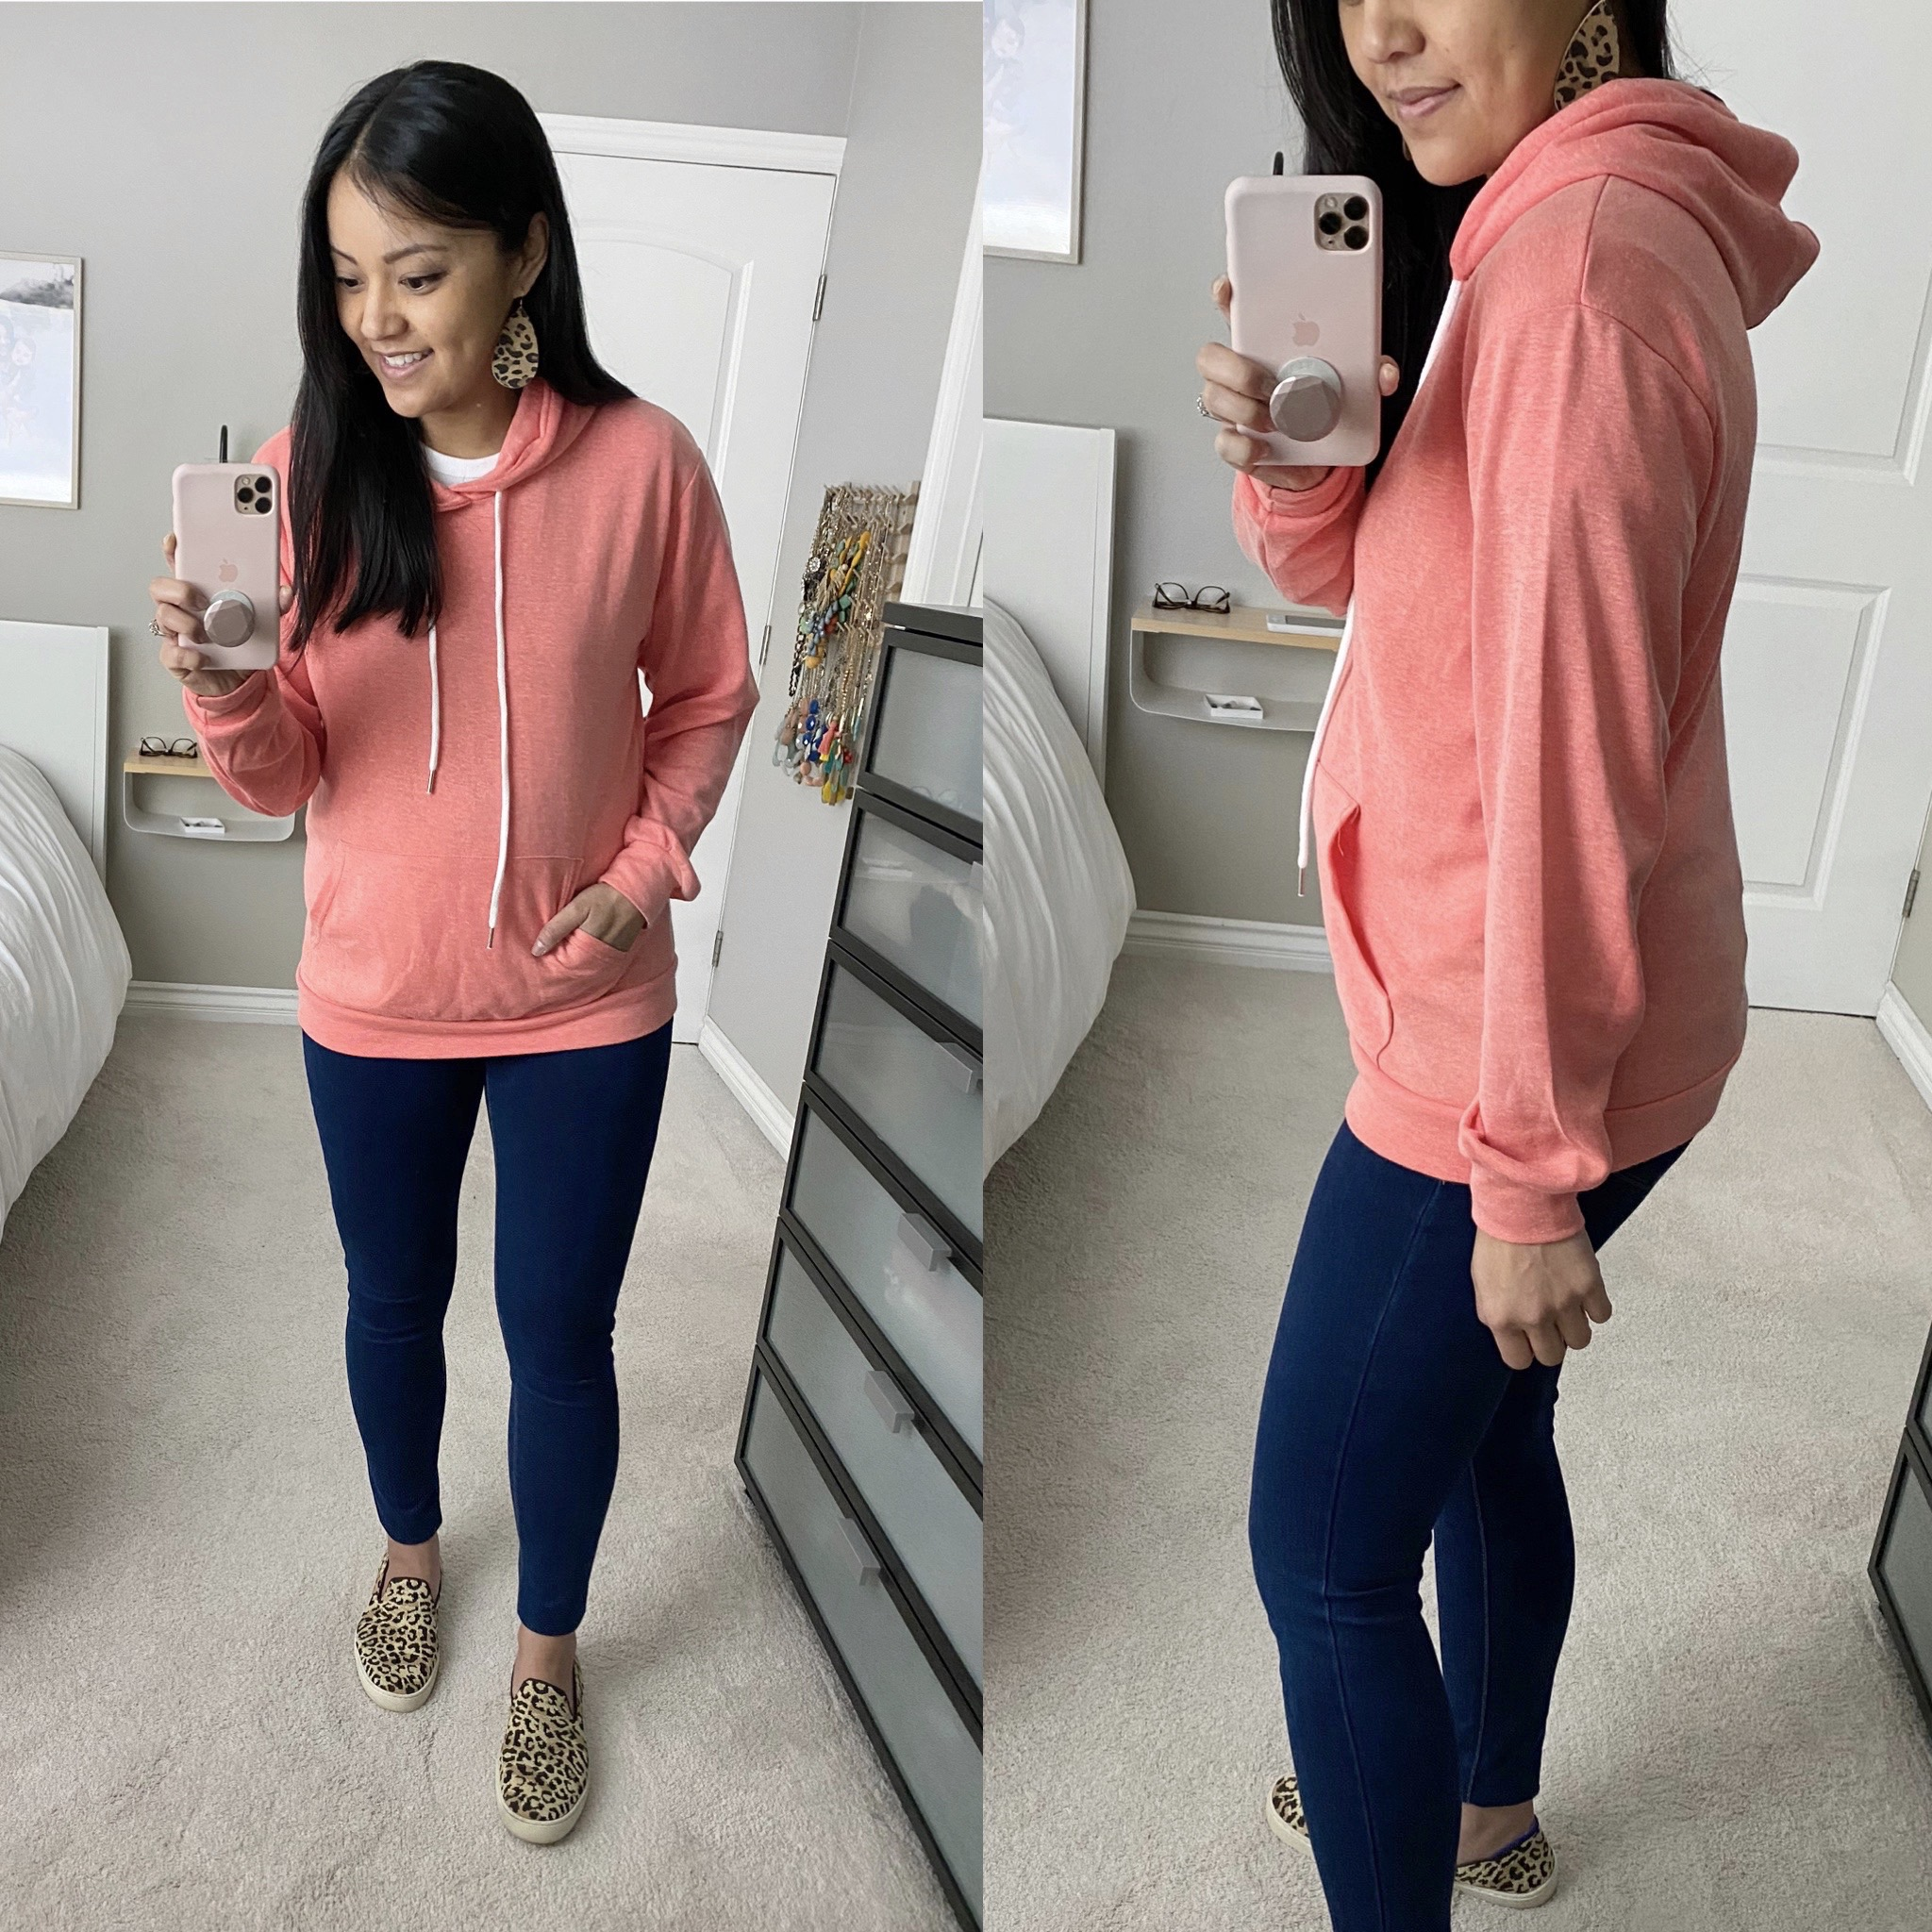 Casual Spring Outfit: orange pullover hoodie + dark skinny jeans + leopard slip-on sneakers + leopard leather earrings